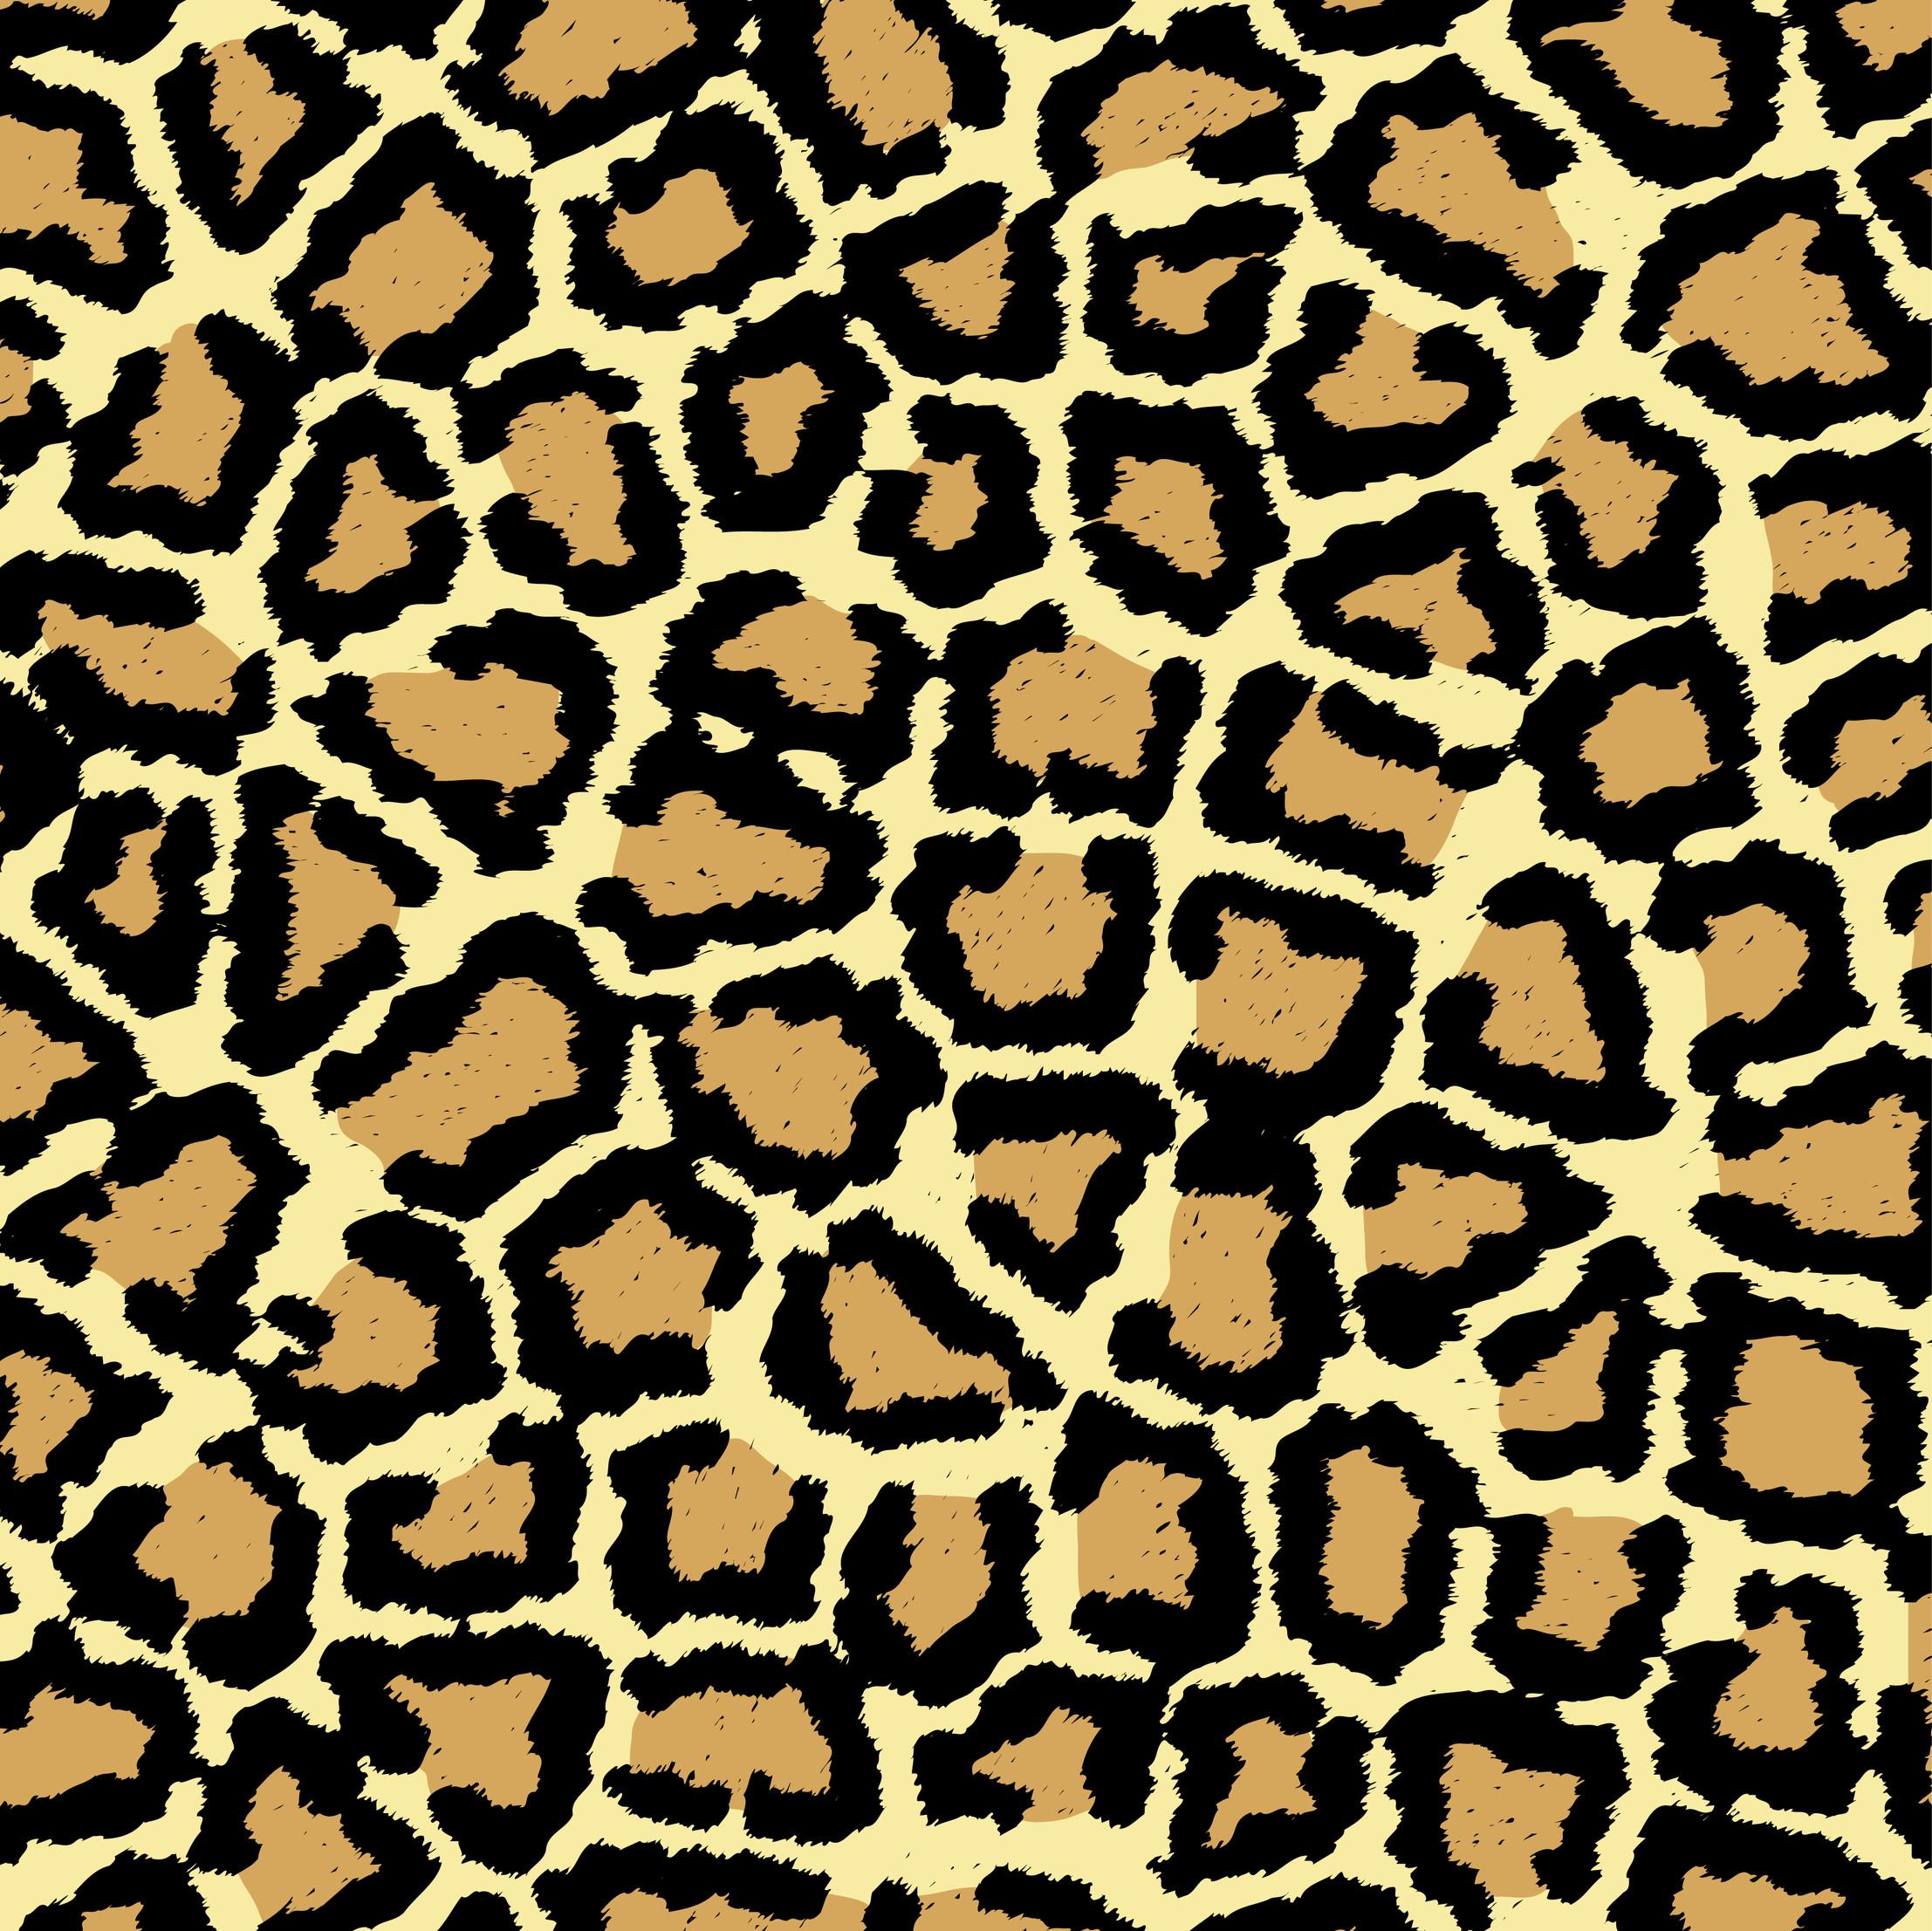 Cheetah spots clipart banner royalty free library Free Cheetah Heart Cliparts, Download Free Clip Art, Free Clip Art ... banner royalty free library